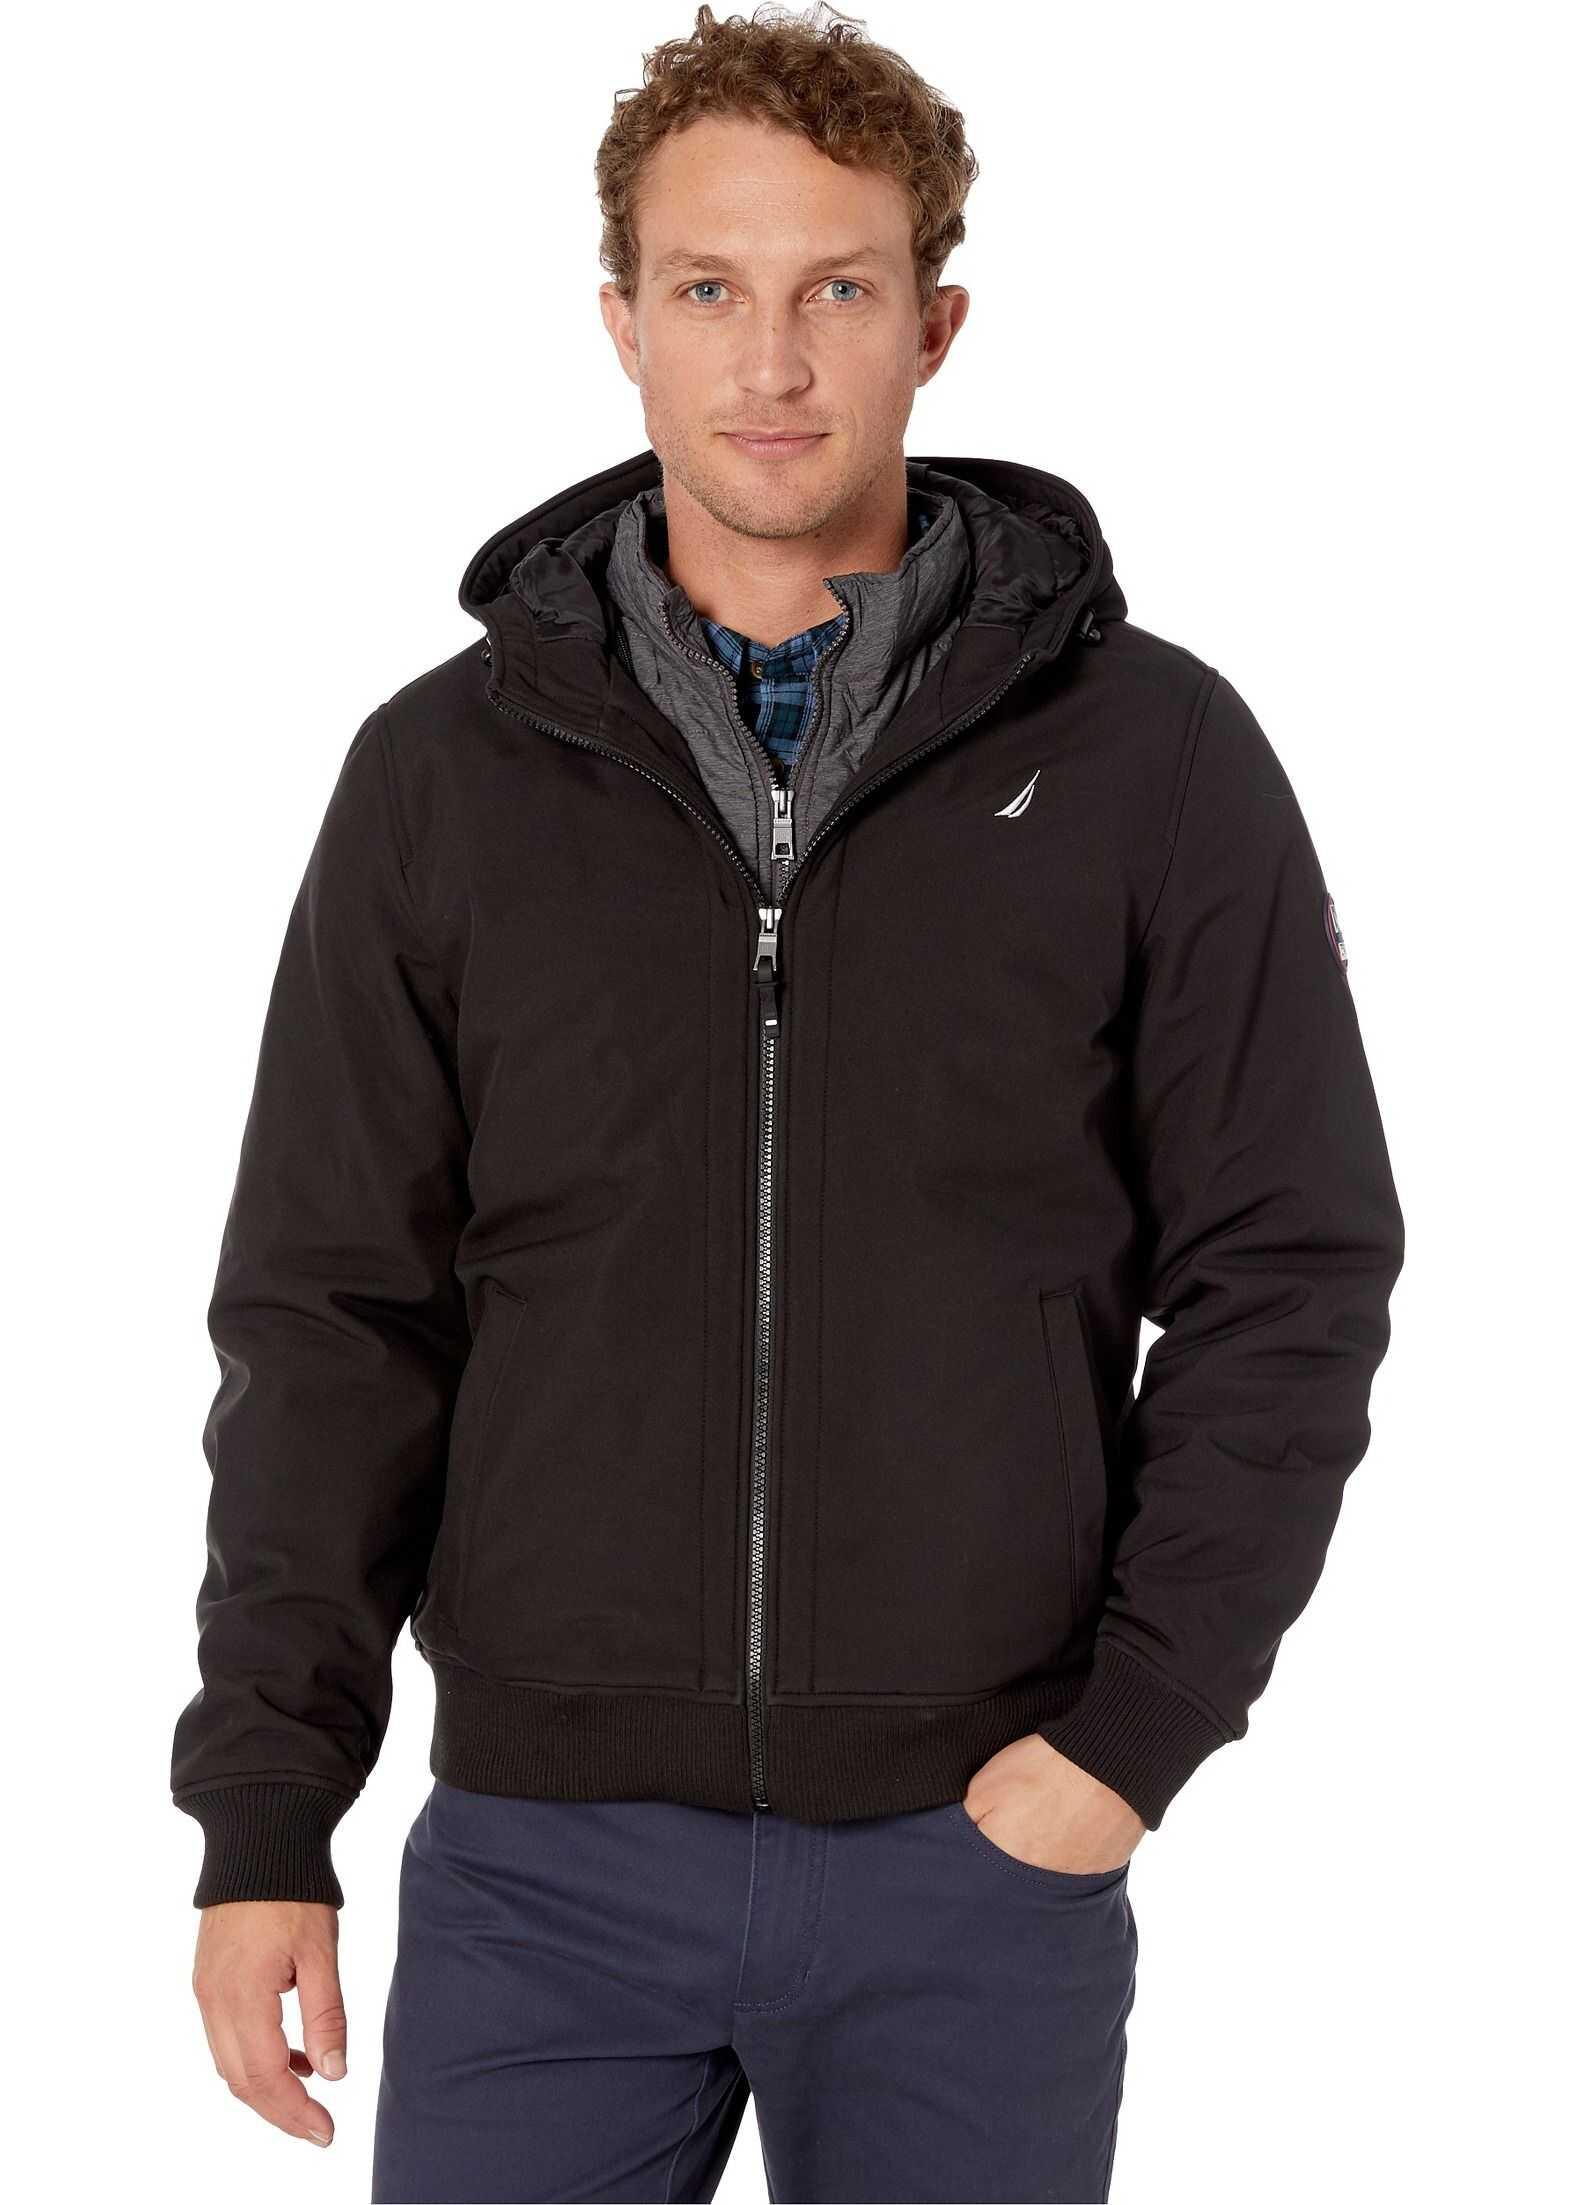 Hooded Softshell Bonded Fleece w/ Inner Bib & Rib Knit Cuffs